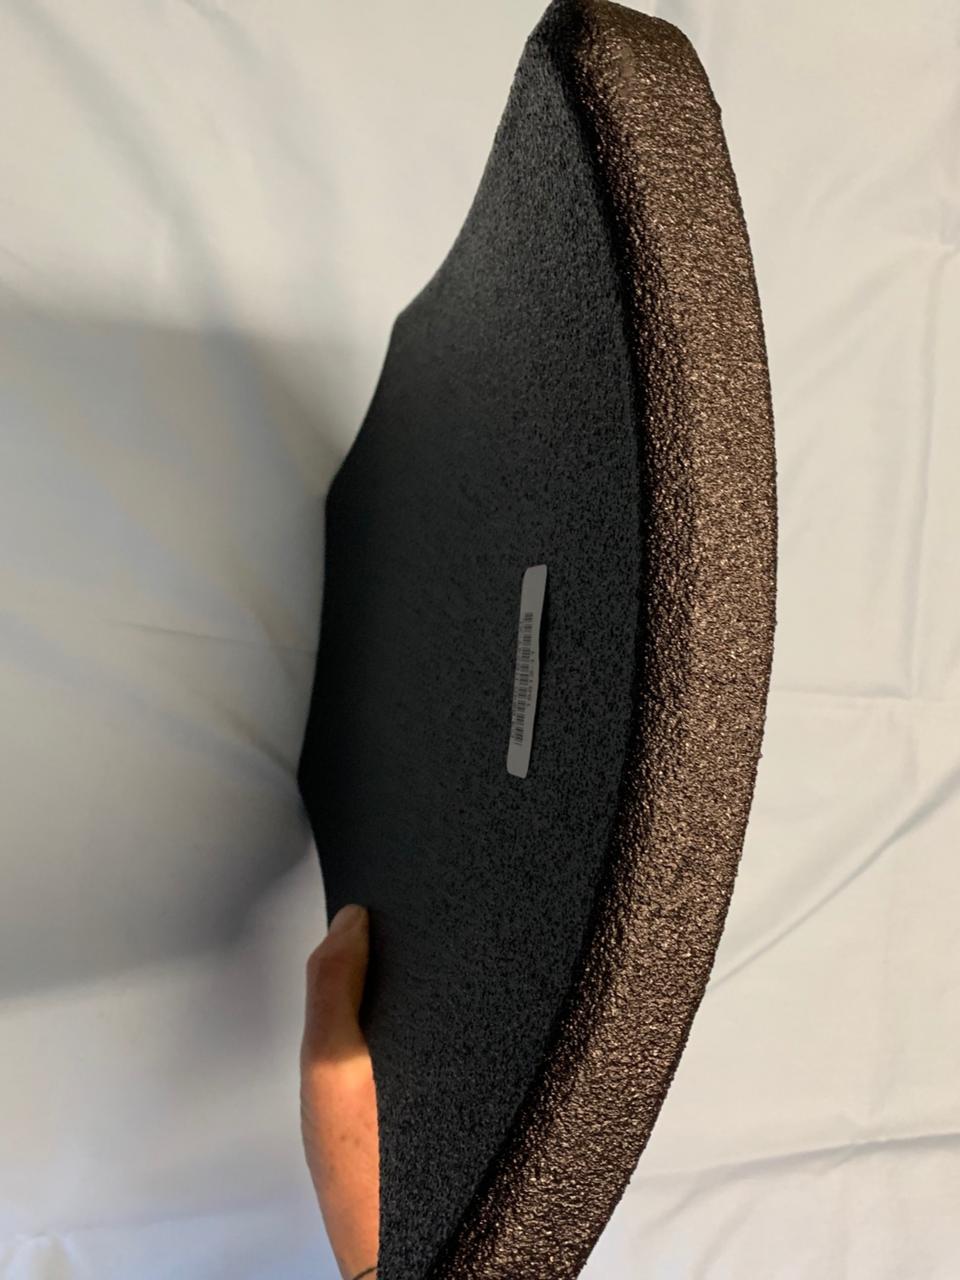 "Level III Lightweight UHMWPE Rifle Plate 11"" x 14"" SAPI"